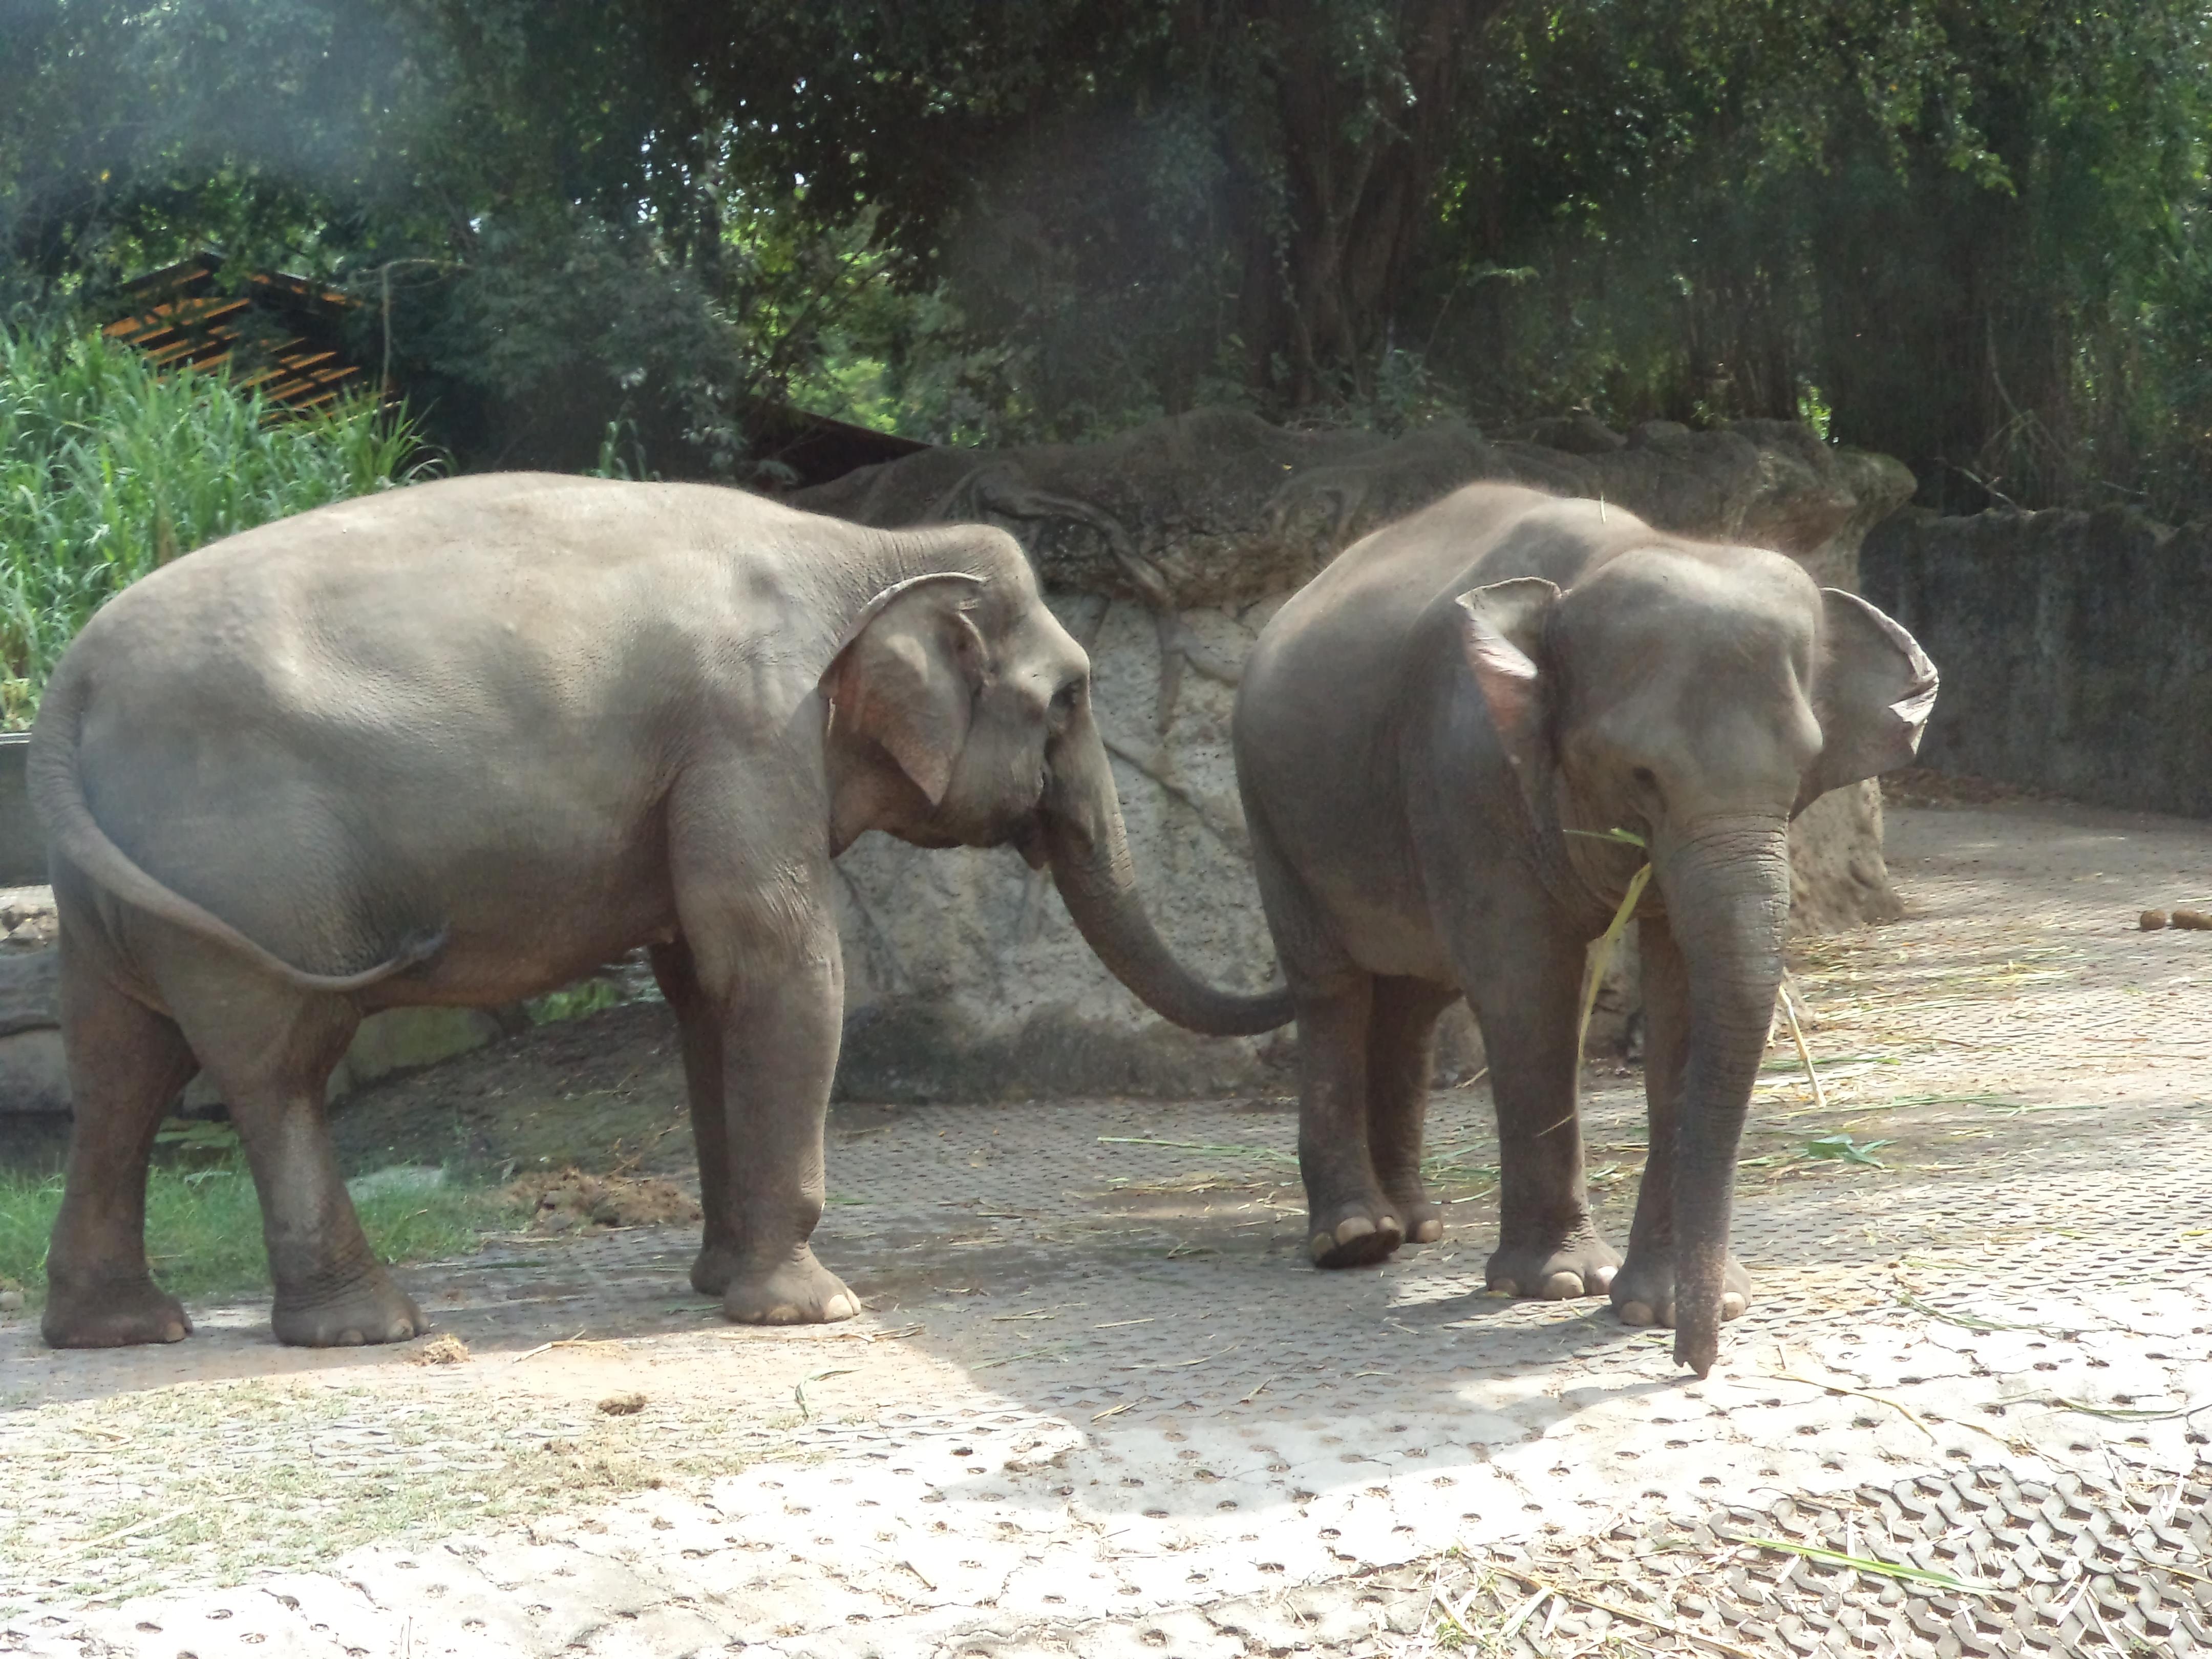 Elephants at Bali Marine and Safari Park